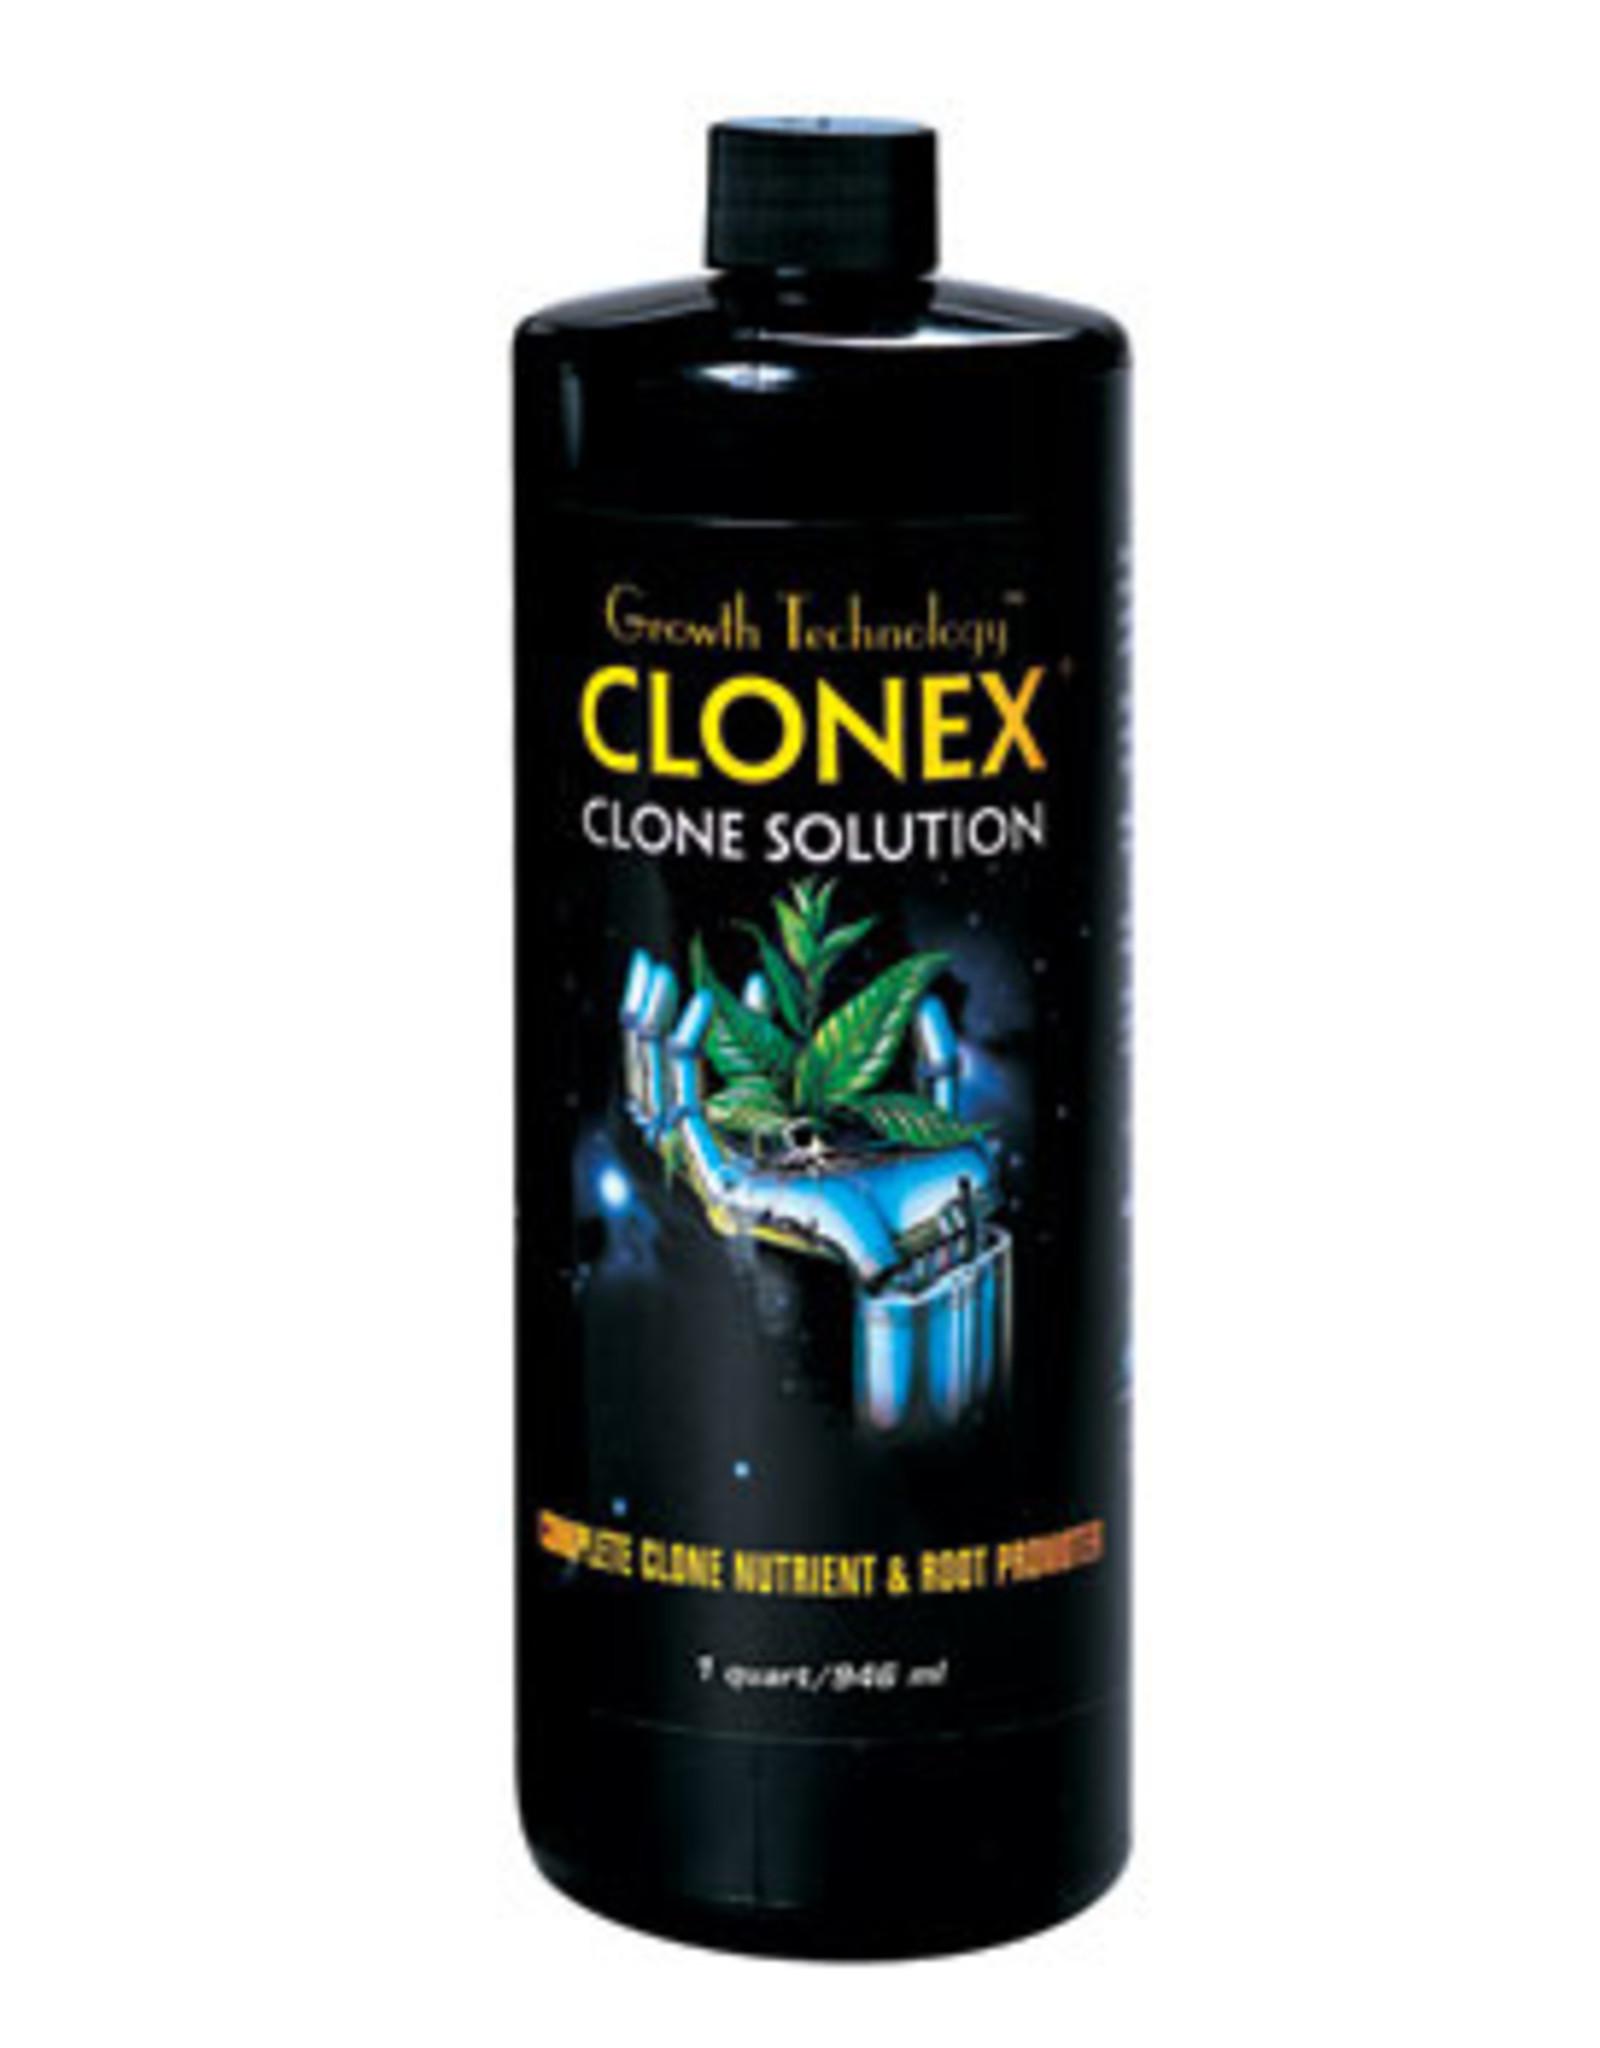 Clonex Clone Solution gal